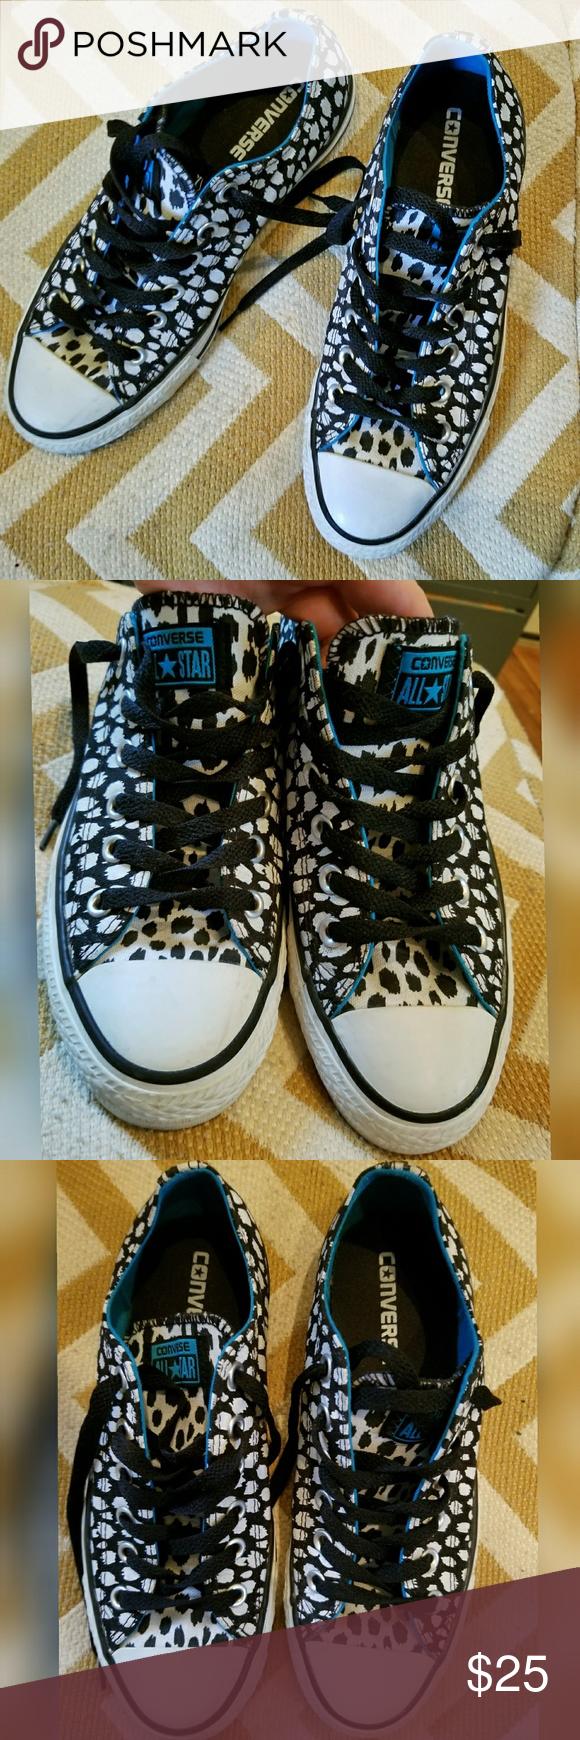 8600f3ad84abbd Converse Black   White Cheetah Spots Sneakers 8